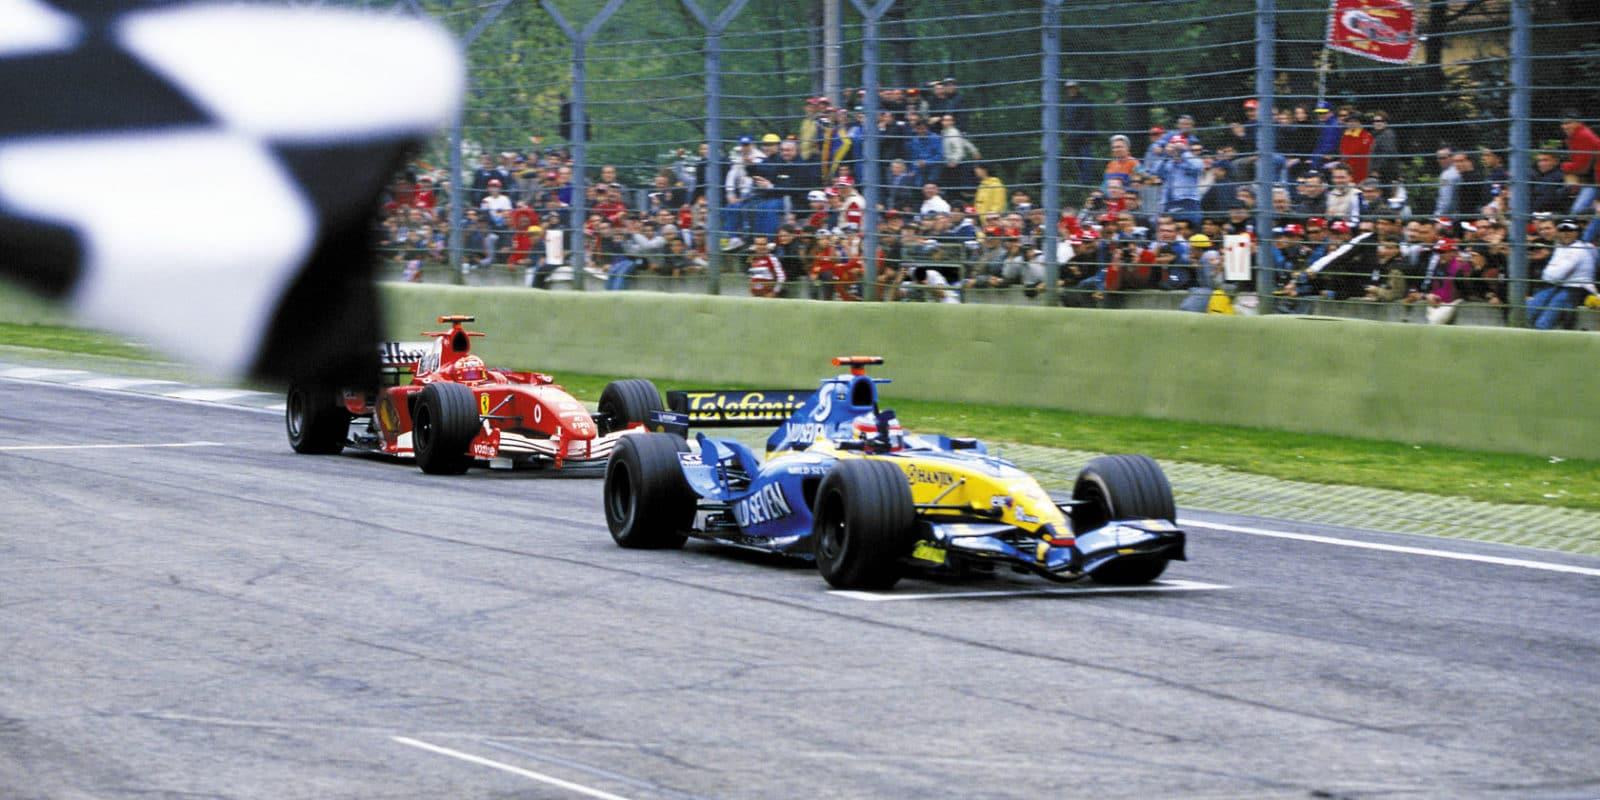 Alonso Schumacher Imola 2005